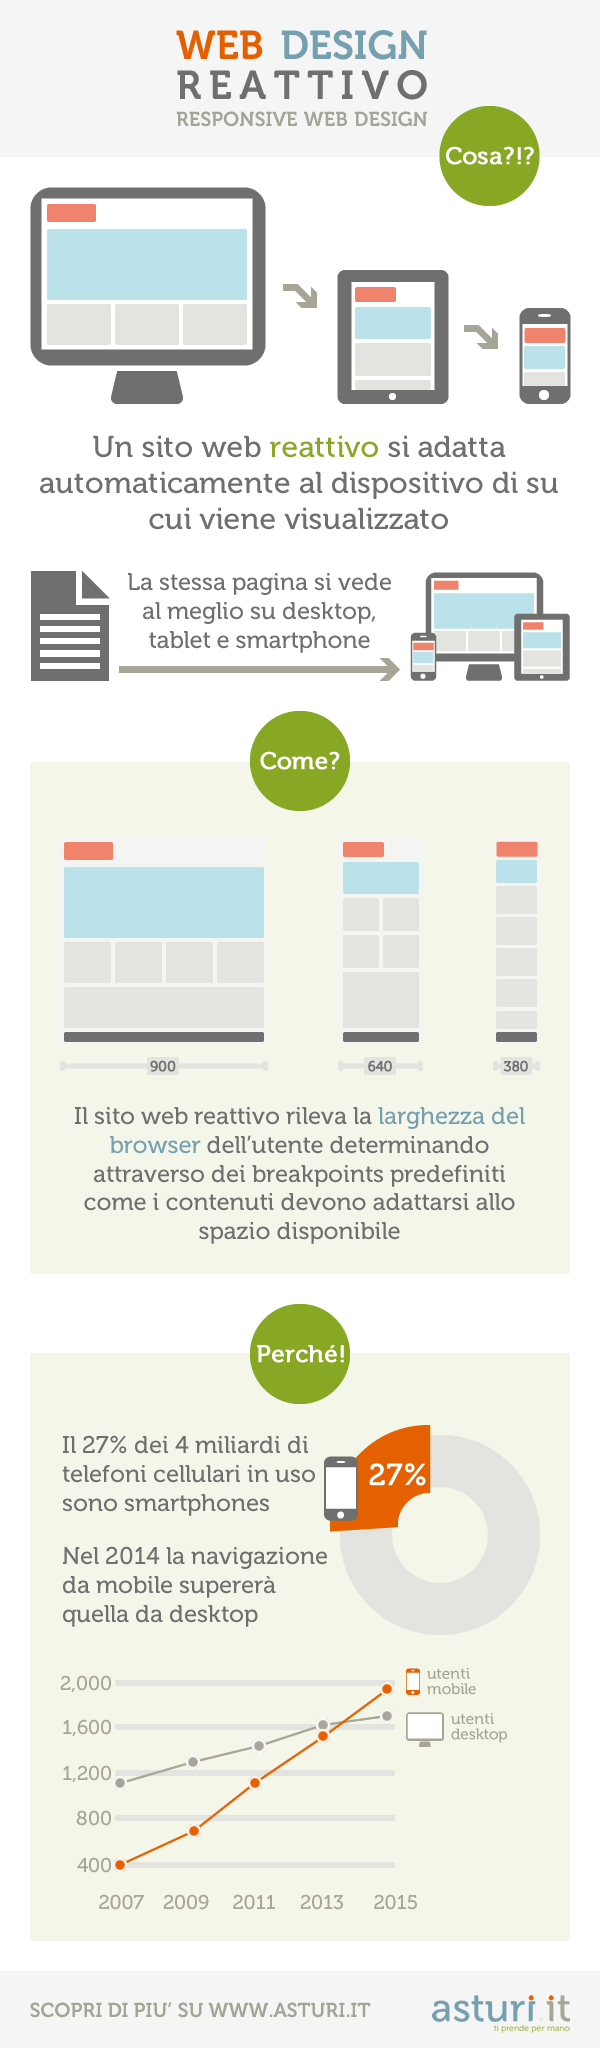 infografica responsive web design